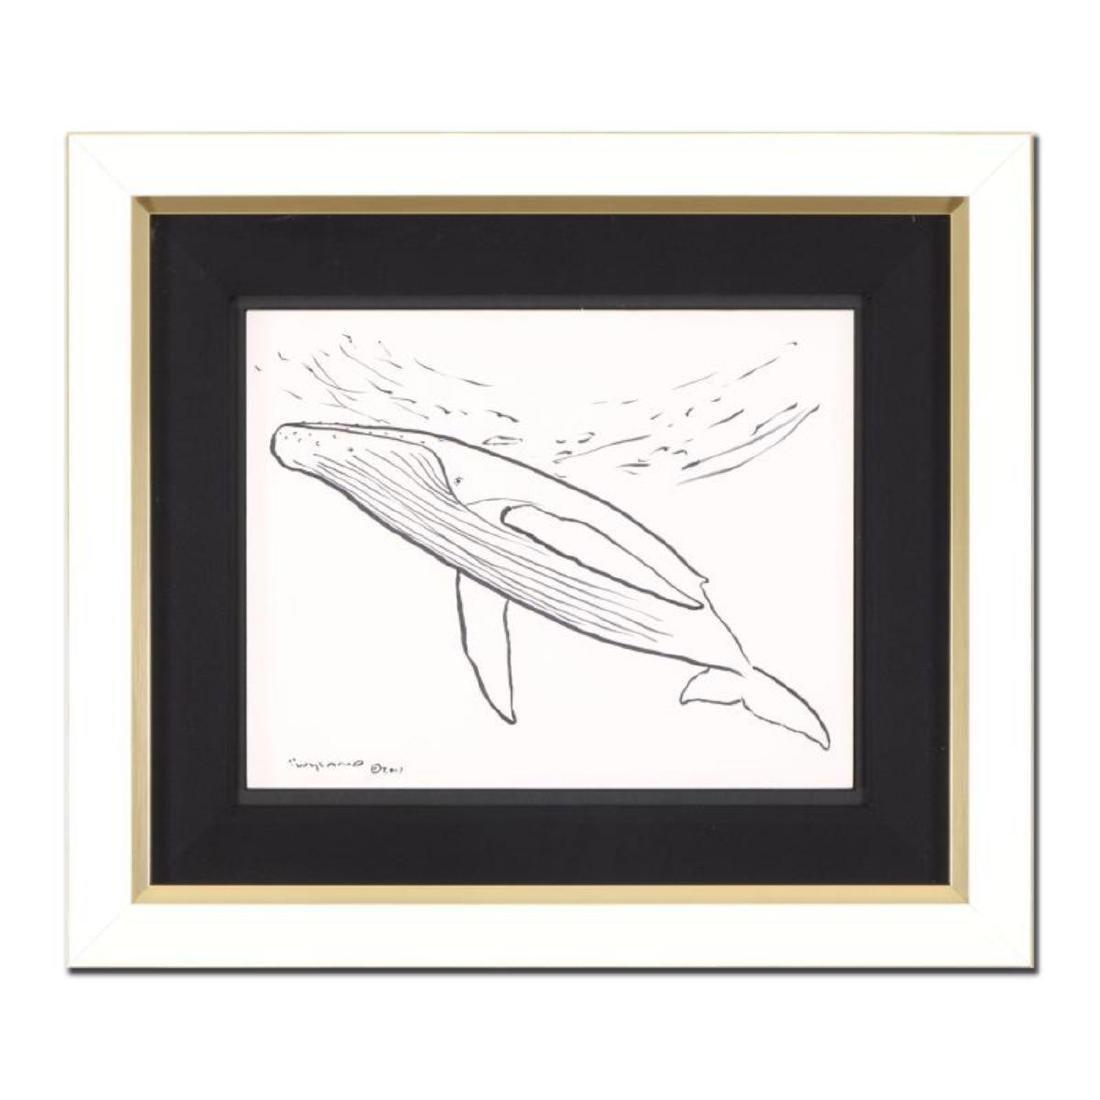 "Wyland - ""Humpback Whale"" Framed Original Sketch, Hand"